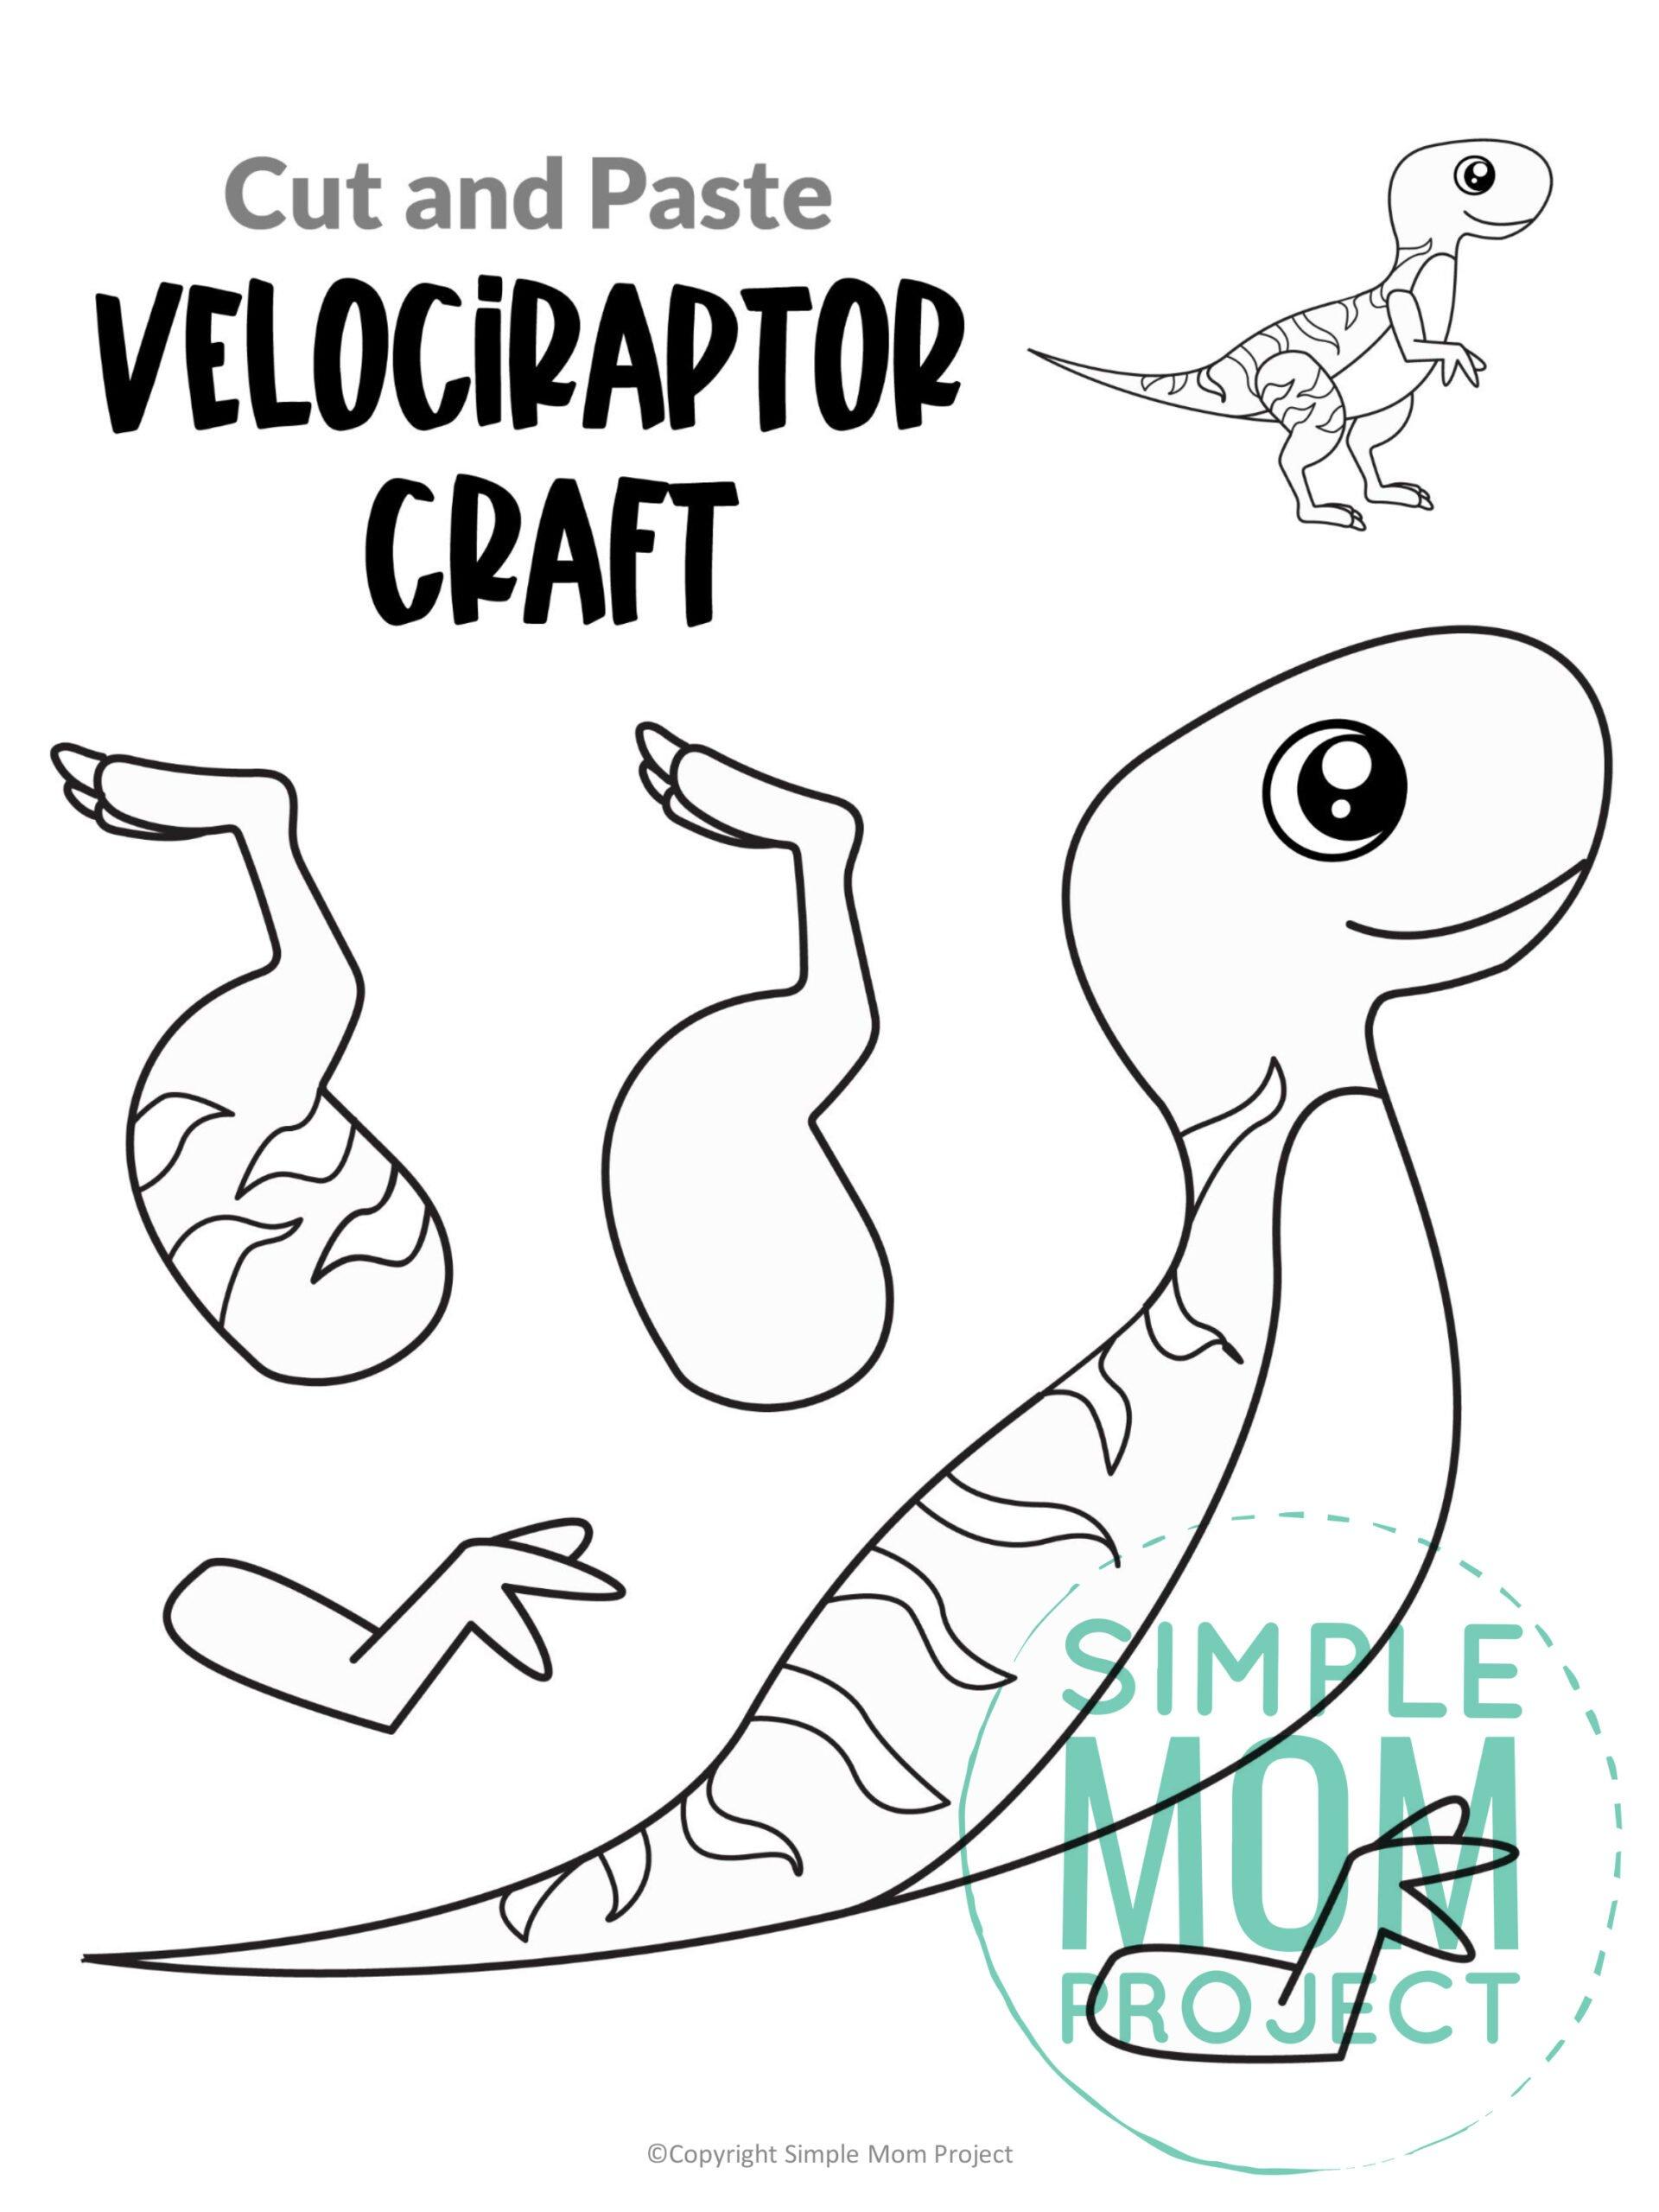 Printable Velociraptor Dinosaur Craft for Preschoolers, toddlers and kindergartners